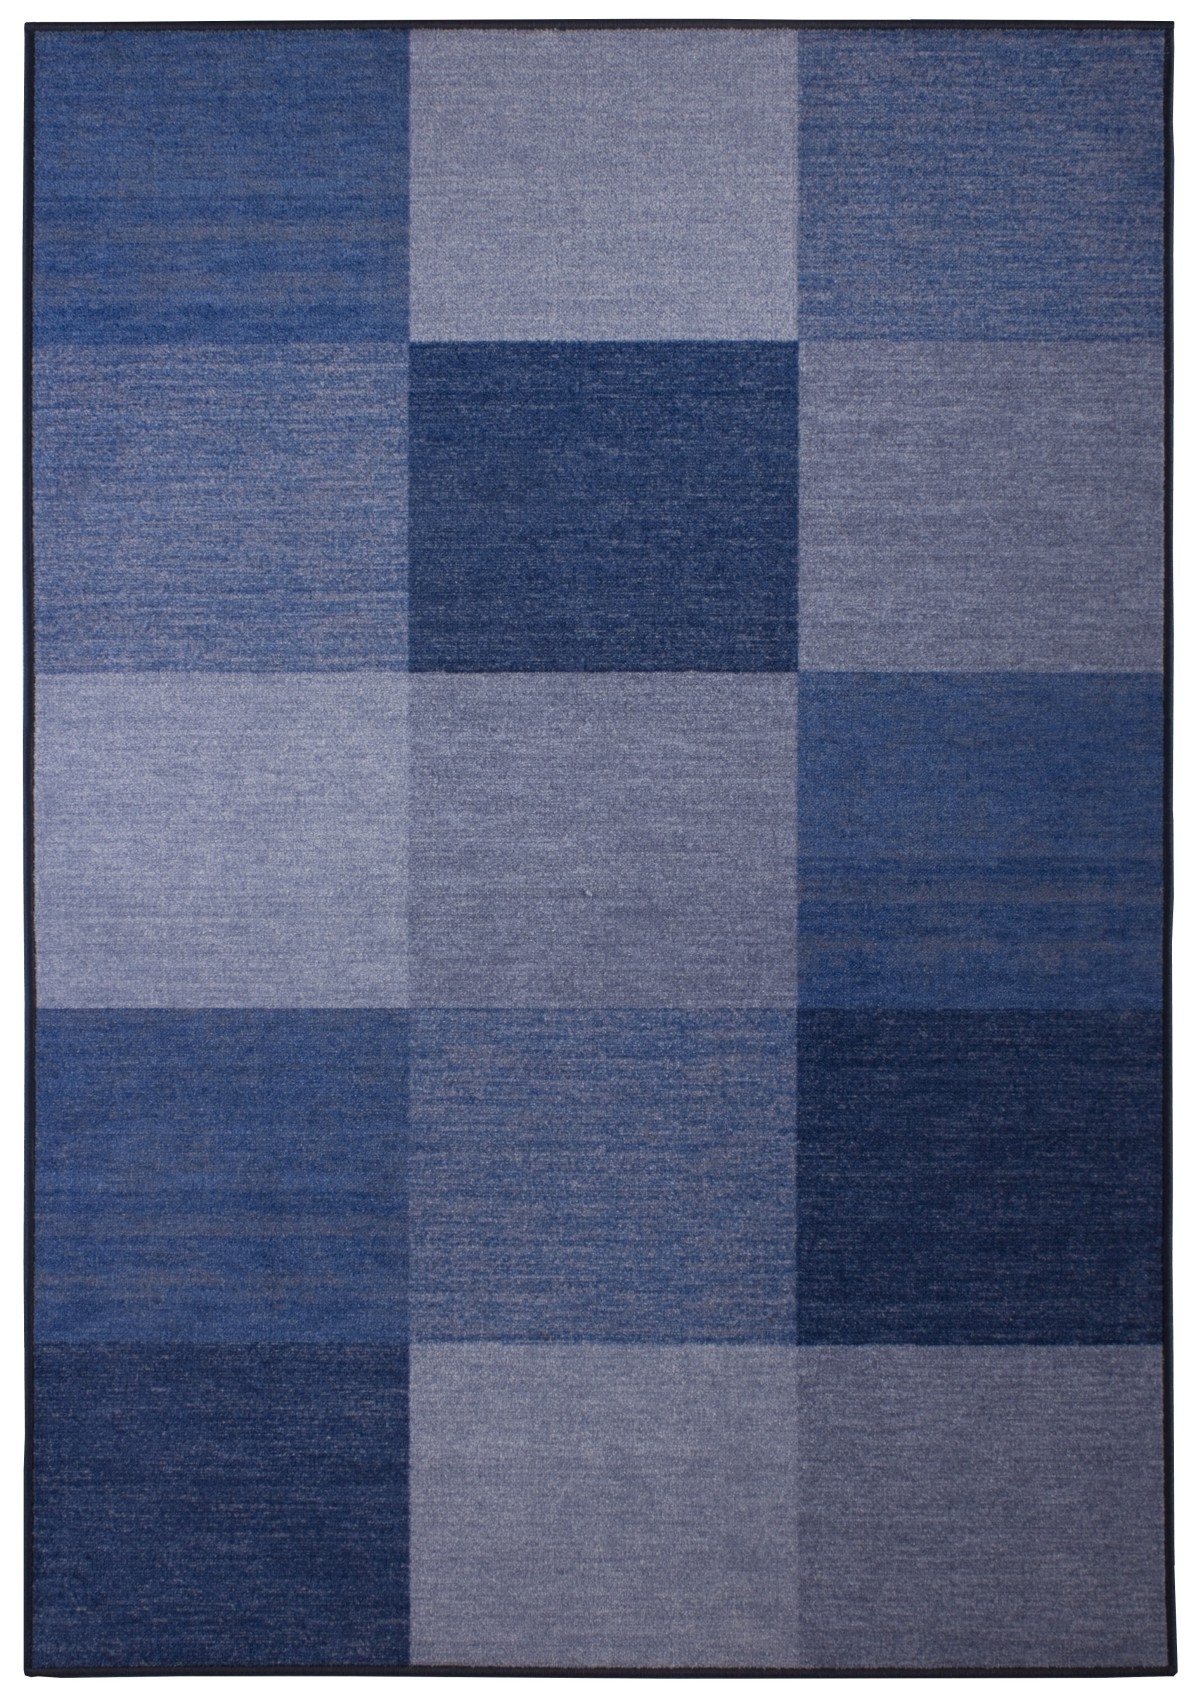 Designer Tuft Teppich Blau Karo Muster Quadrate OekoTex